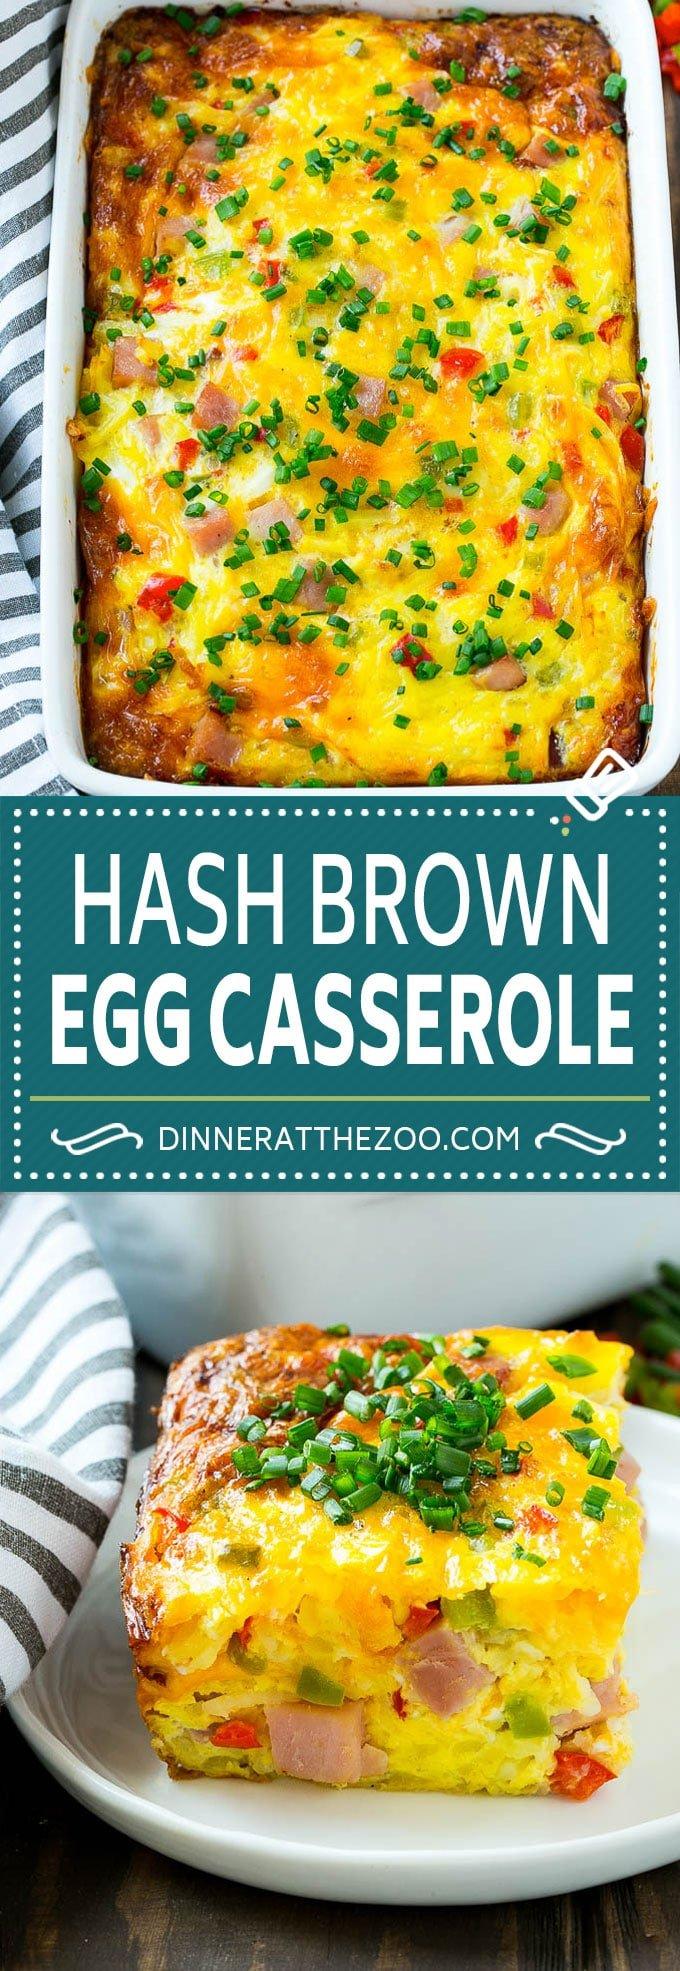 Hash Brown Egg Casserole Recipe | Breakfast Casserole with Ham | Hash Brown Casserole | Ham and Egg Casserole | Egg Casserole with Ham #breakfast #casserole #eggs #ham #dinneratthezoo #brunch